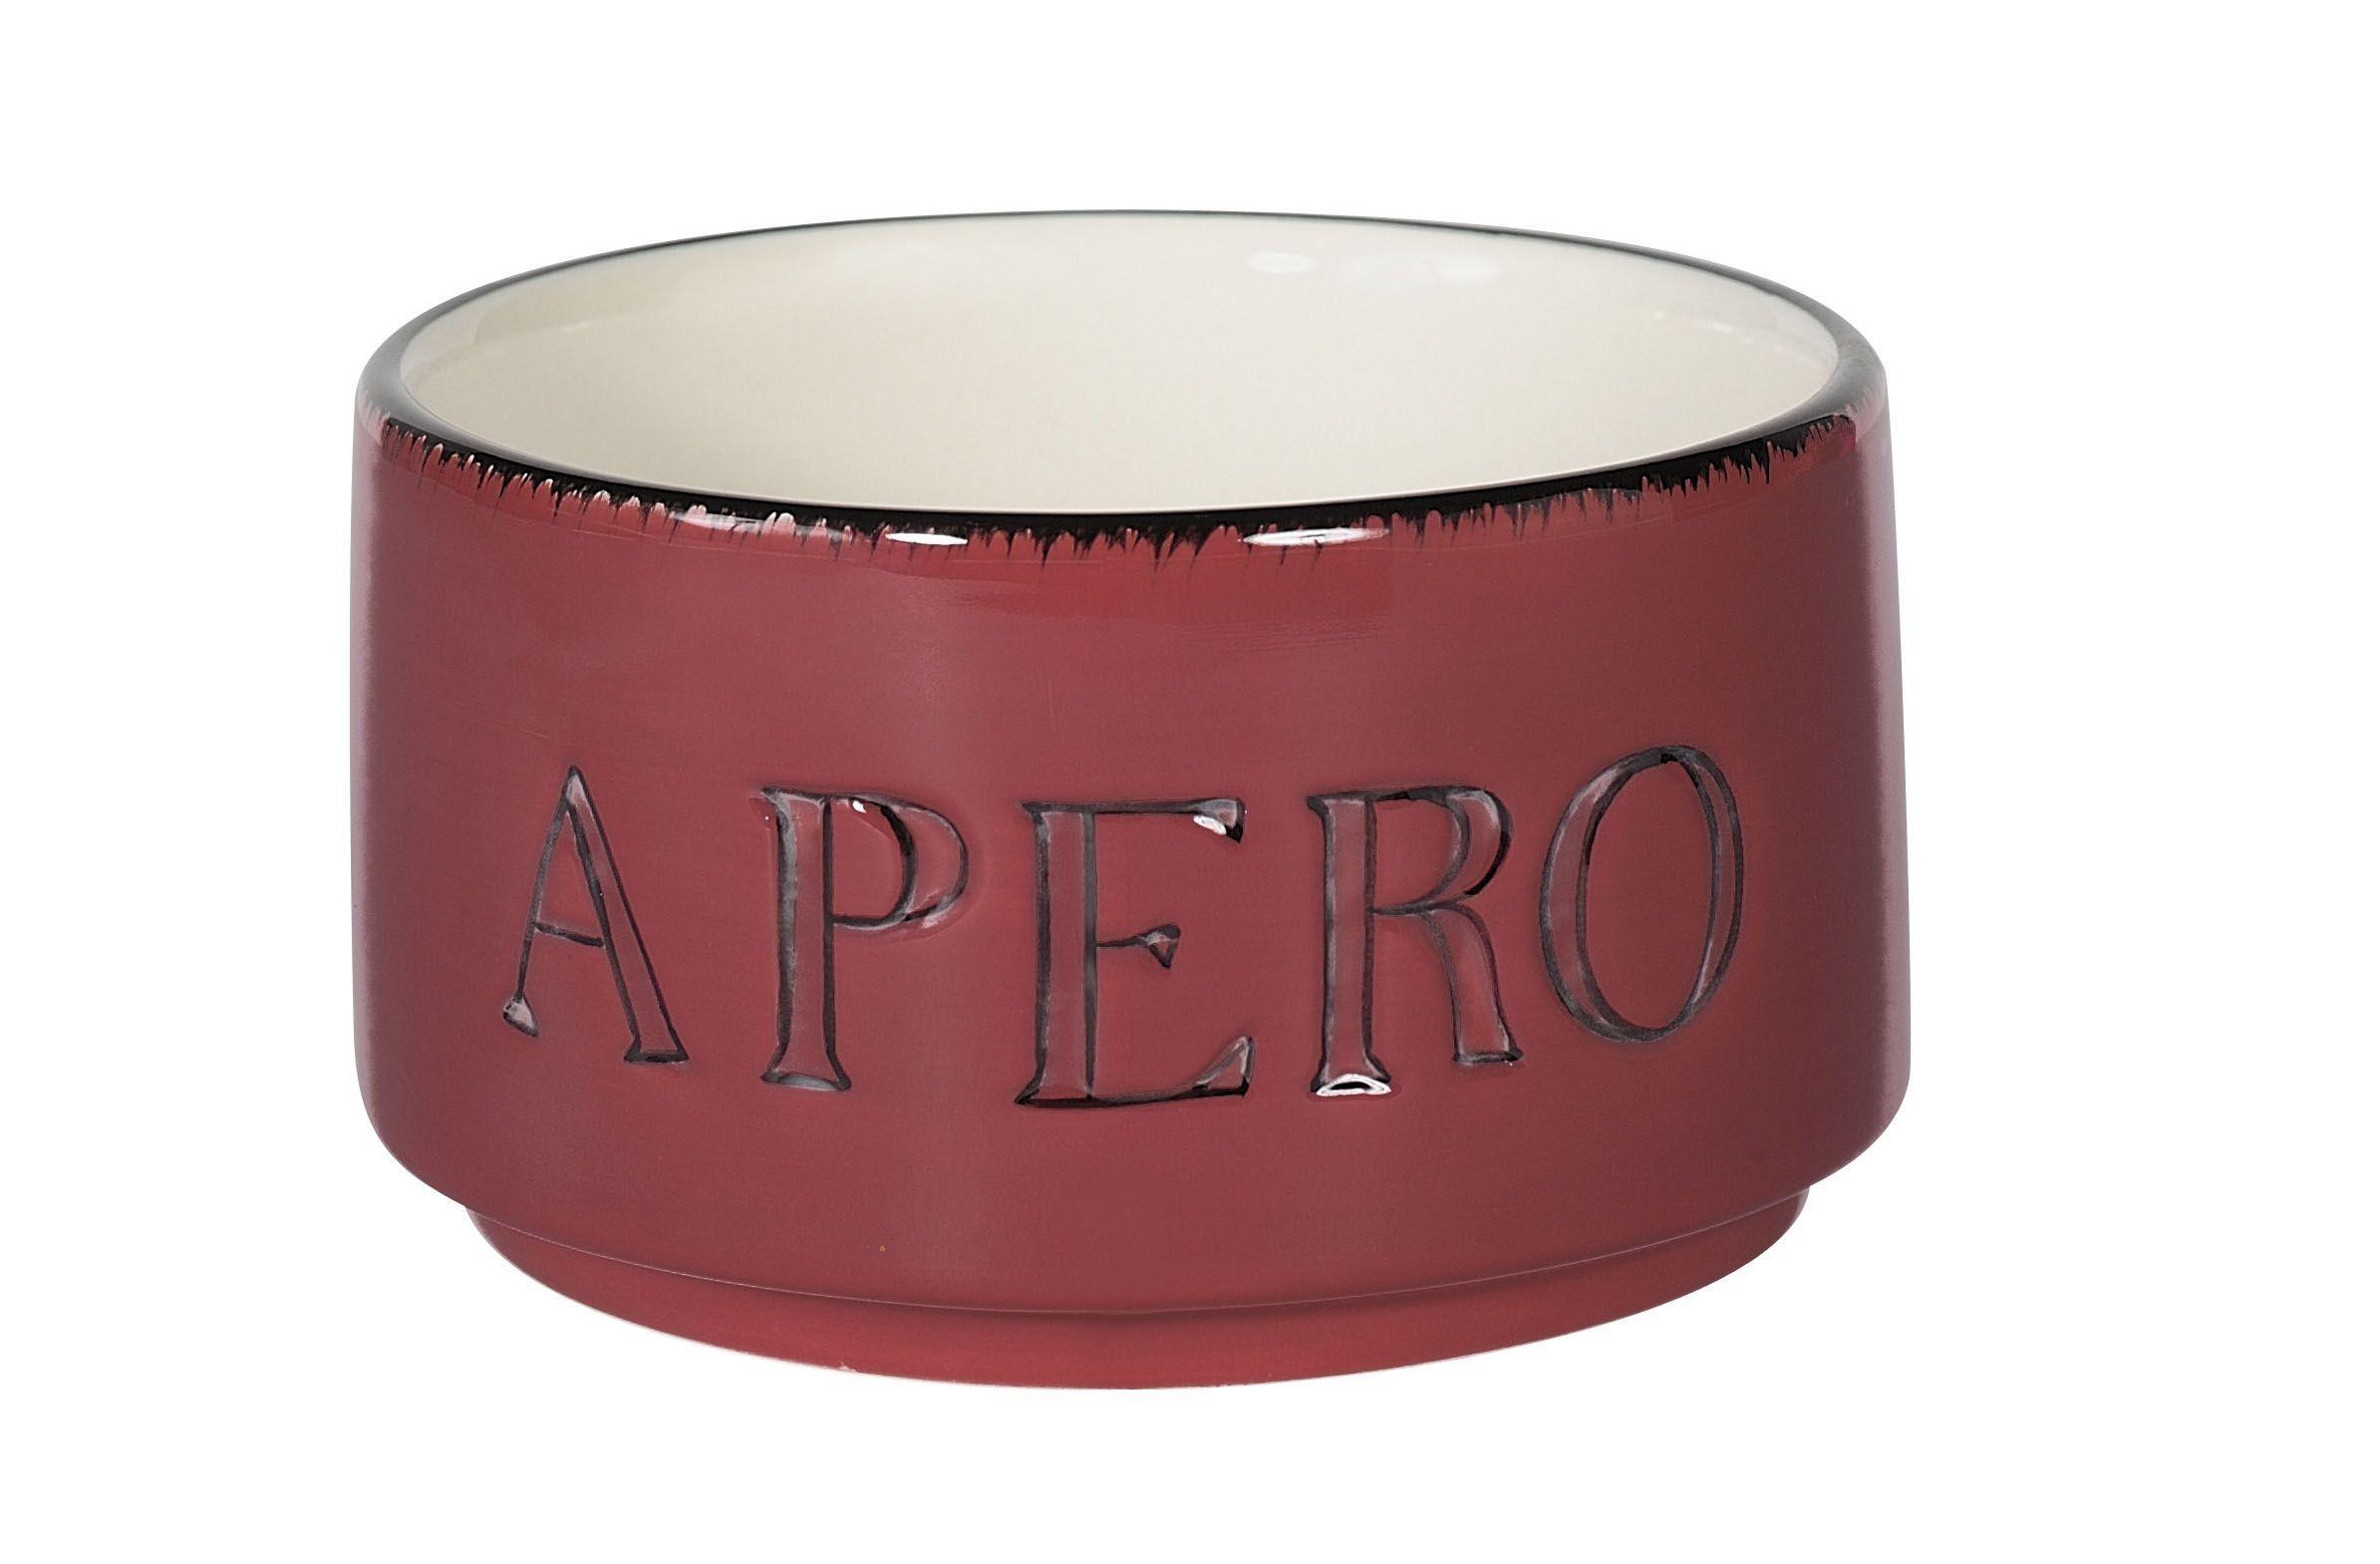 Apéro  -  Bol apéro framboise en céramique (par4)